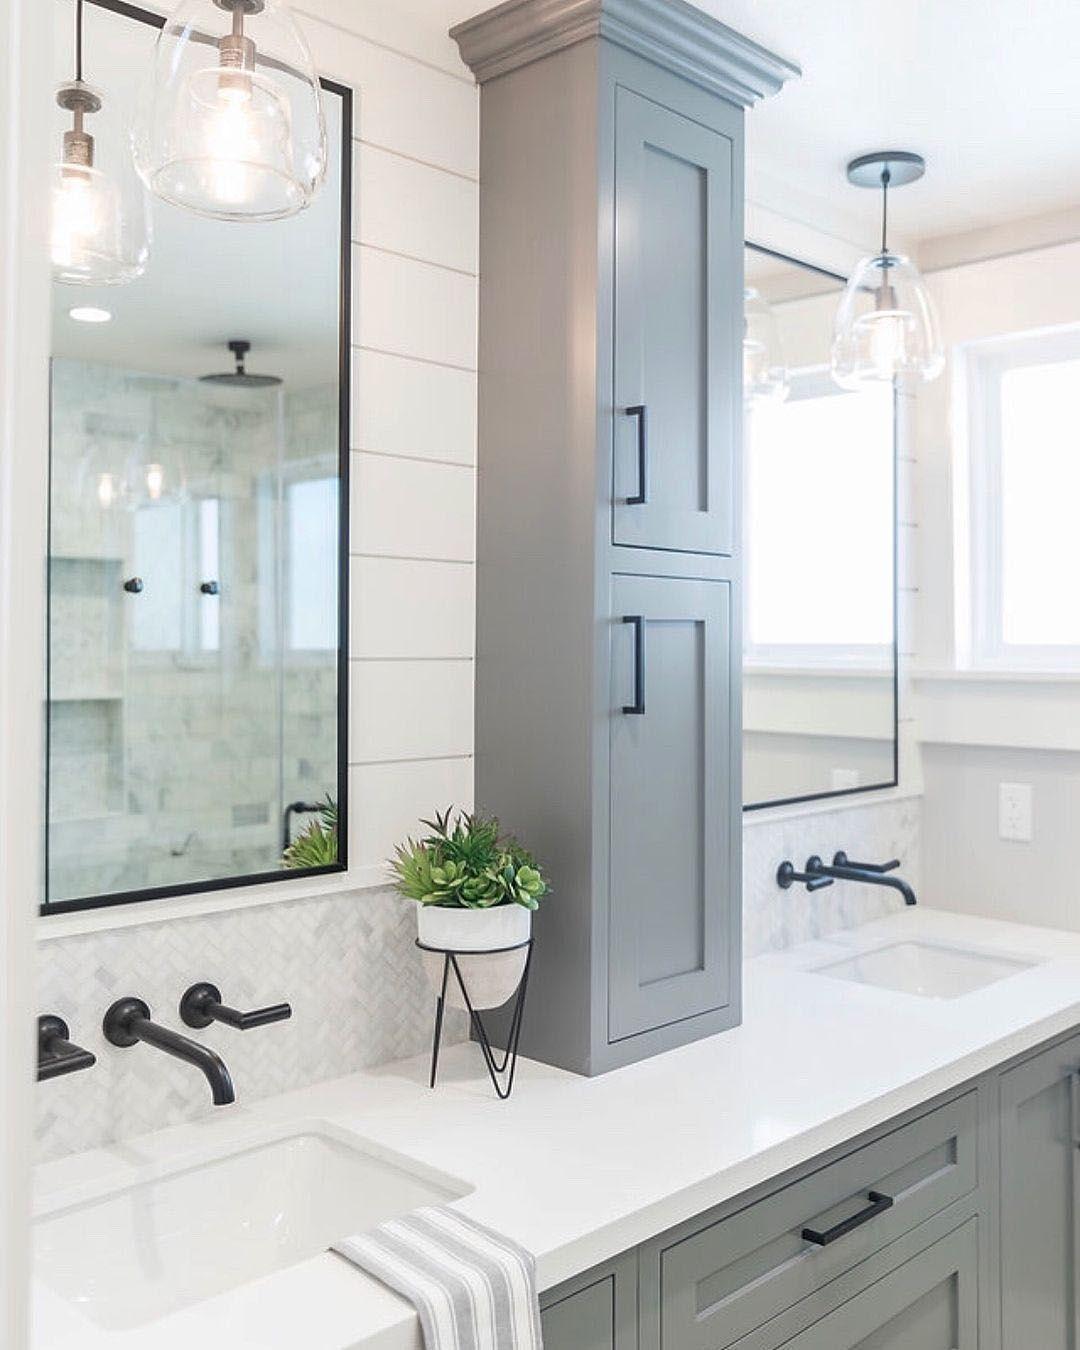 Terrific Bathroom Mirror Ideas For Double Sinks For 2019 Affordable Bathroom Remodel Bathroom Remodel Designs Bathrooms Remodel [ 1350 x 1080 Pixel ]